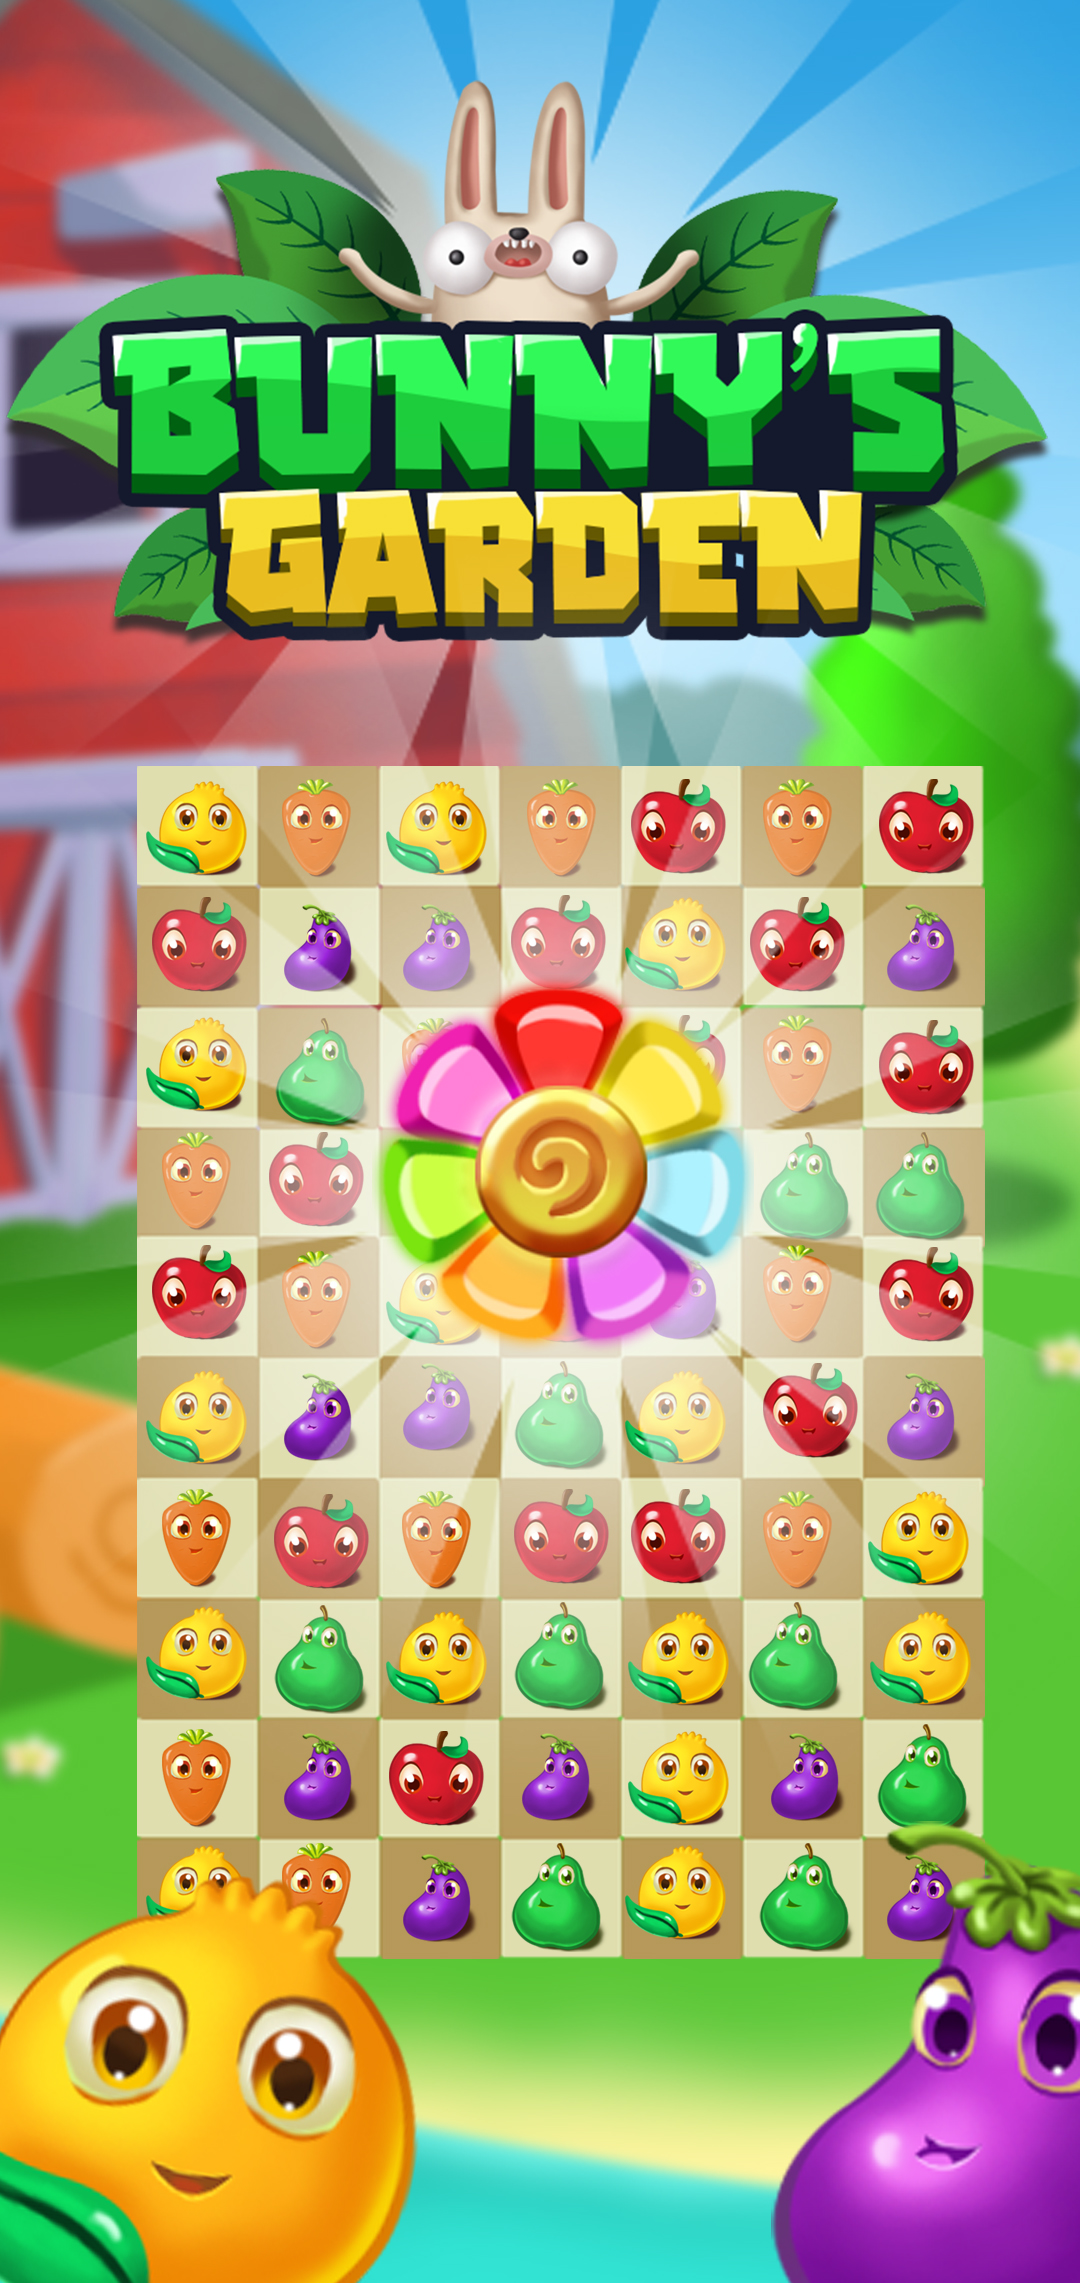 Bunny's Garden – Match 3 Puzzle